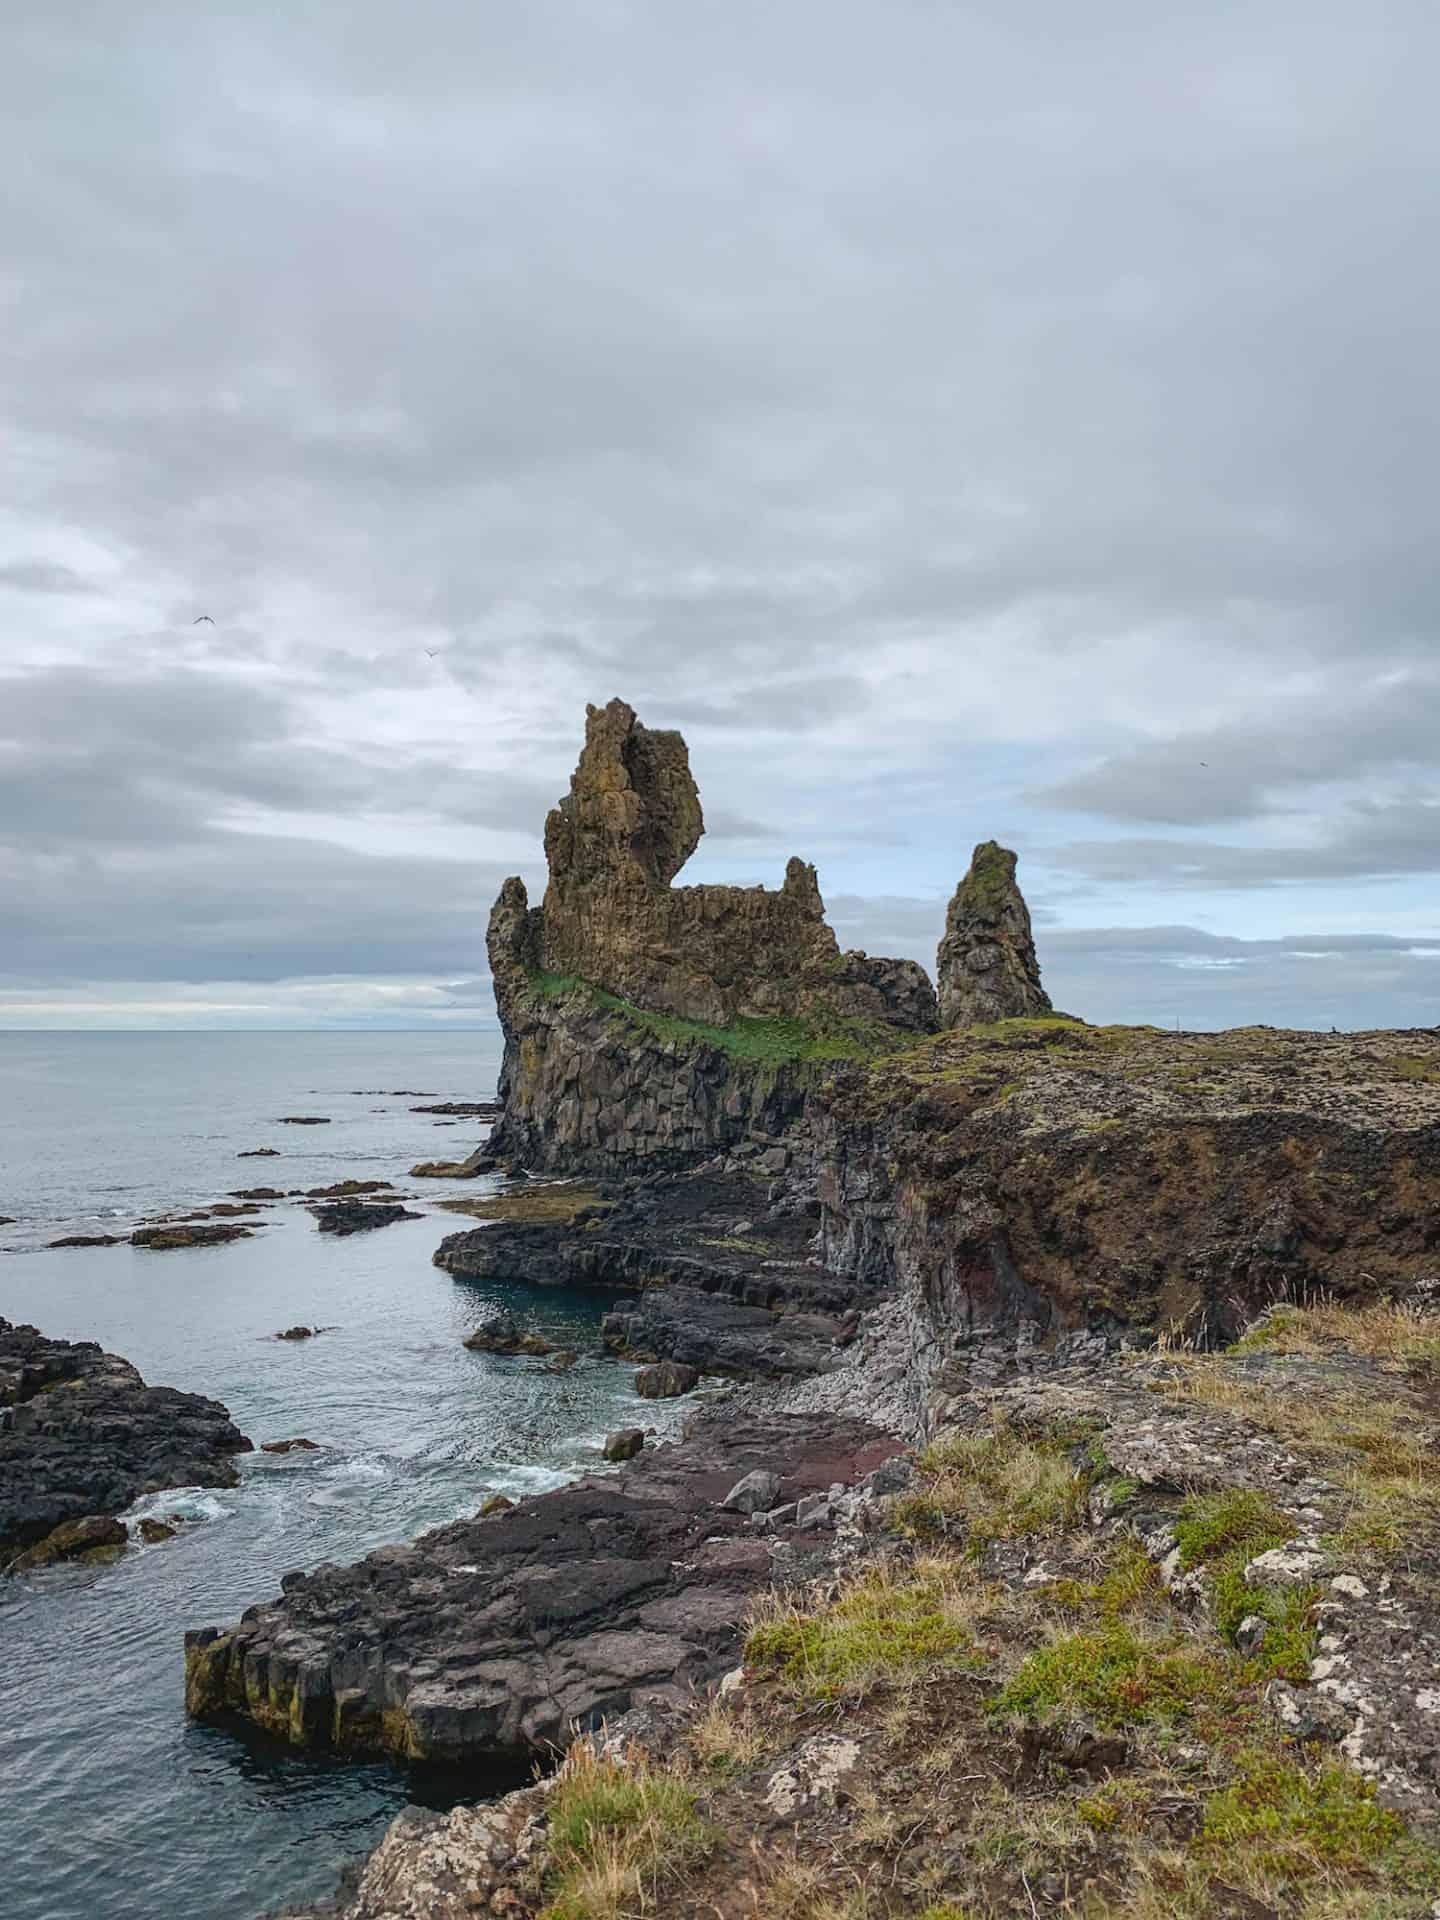 Snæfellsjökull National Park in Iceland